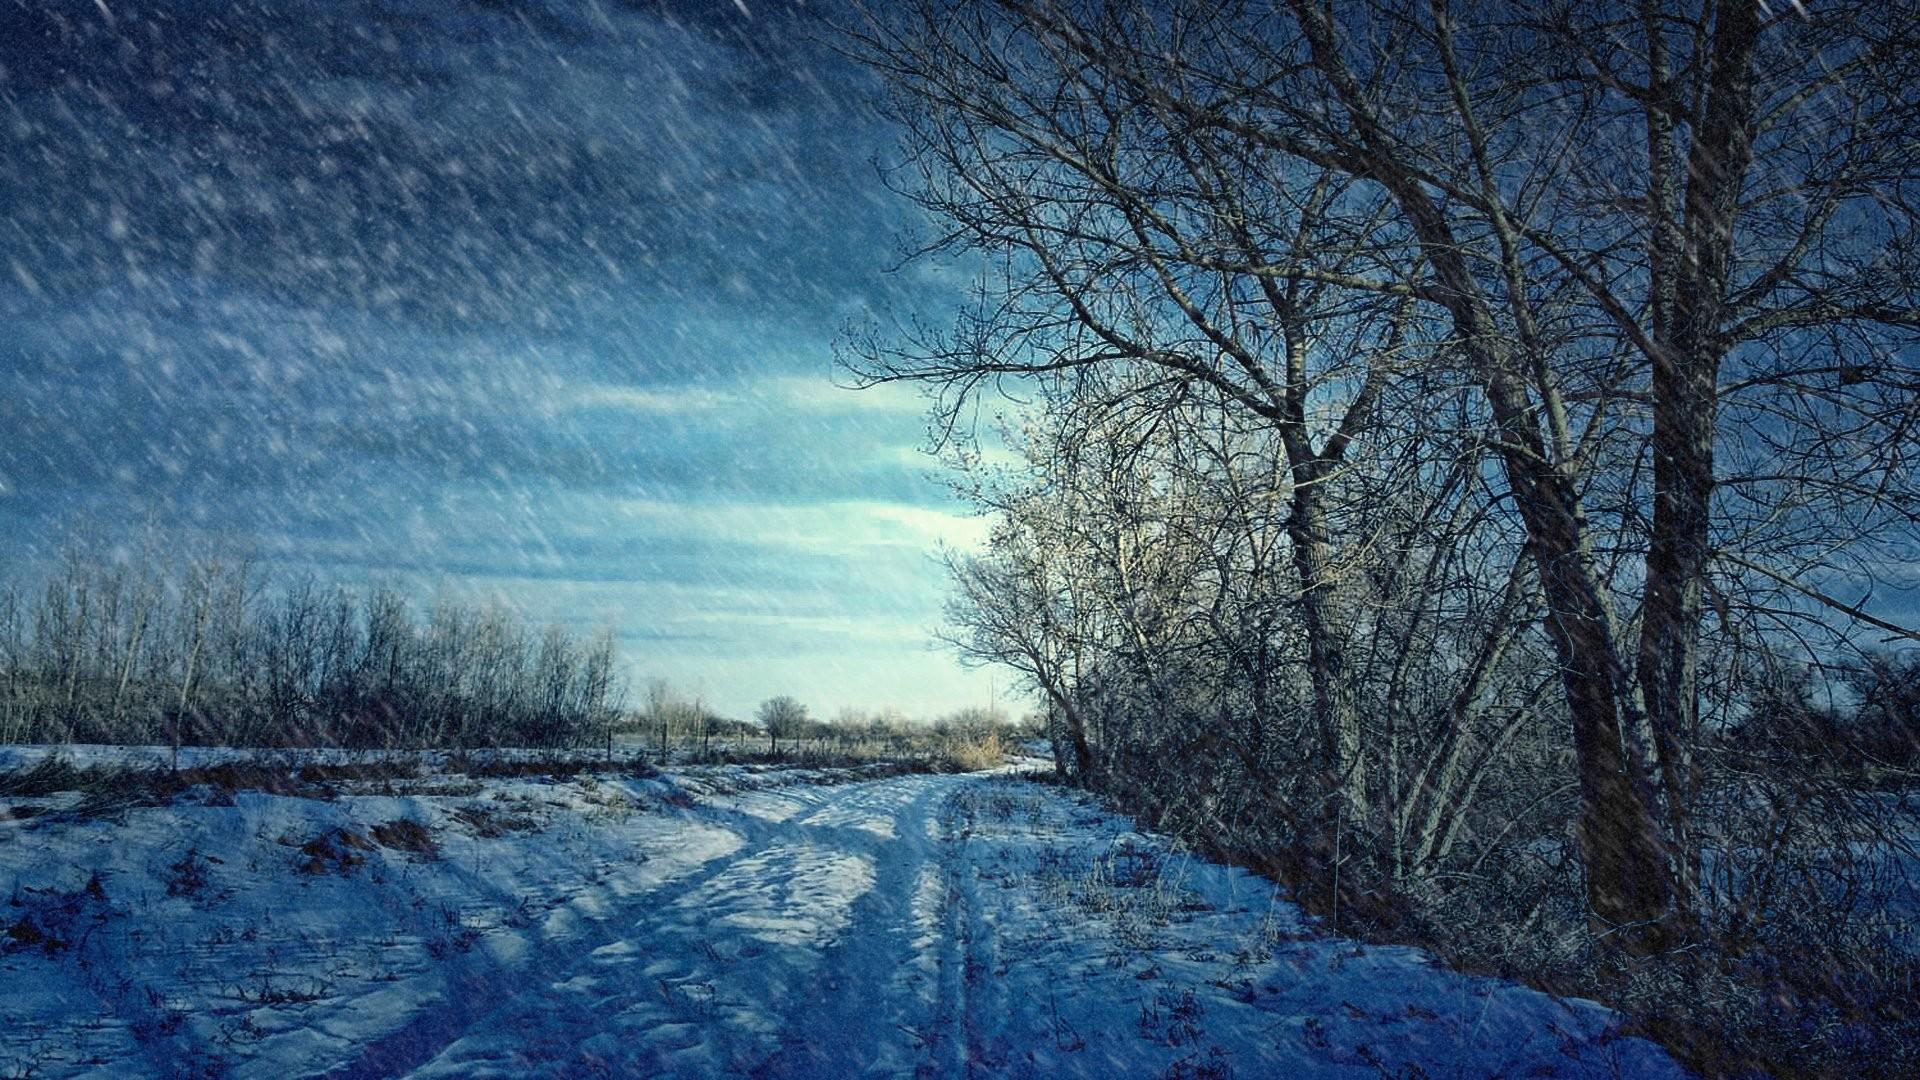 Winter Scenes Screensavers Free